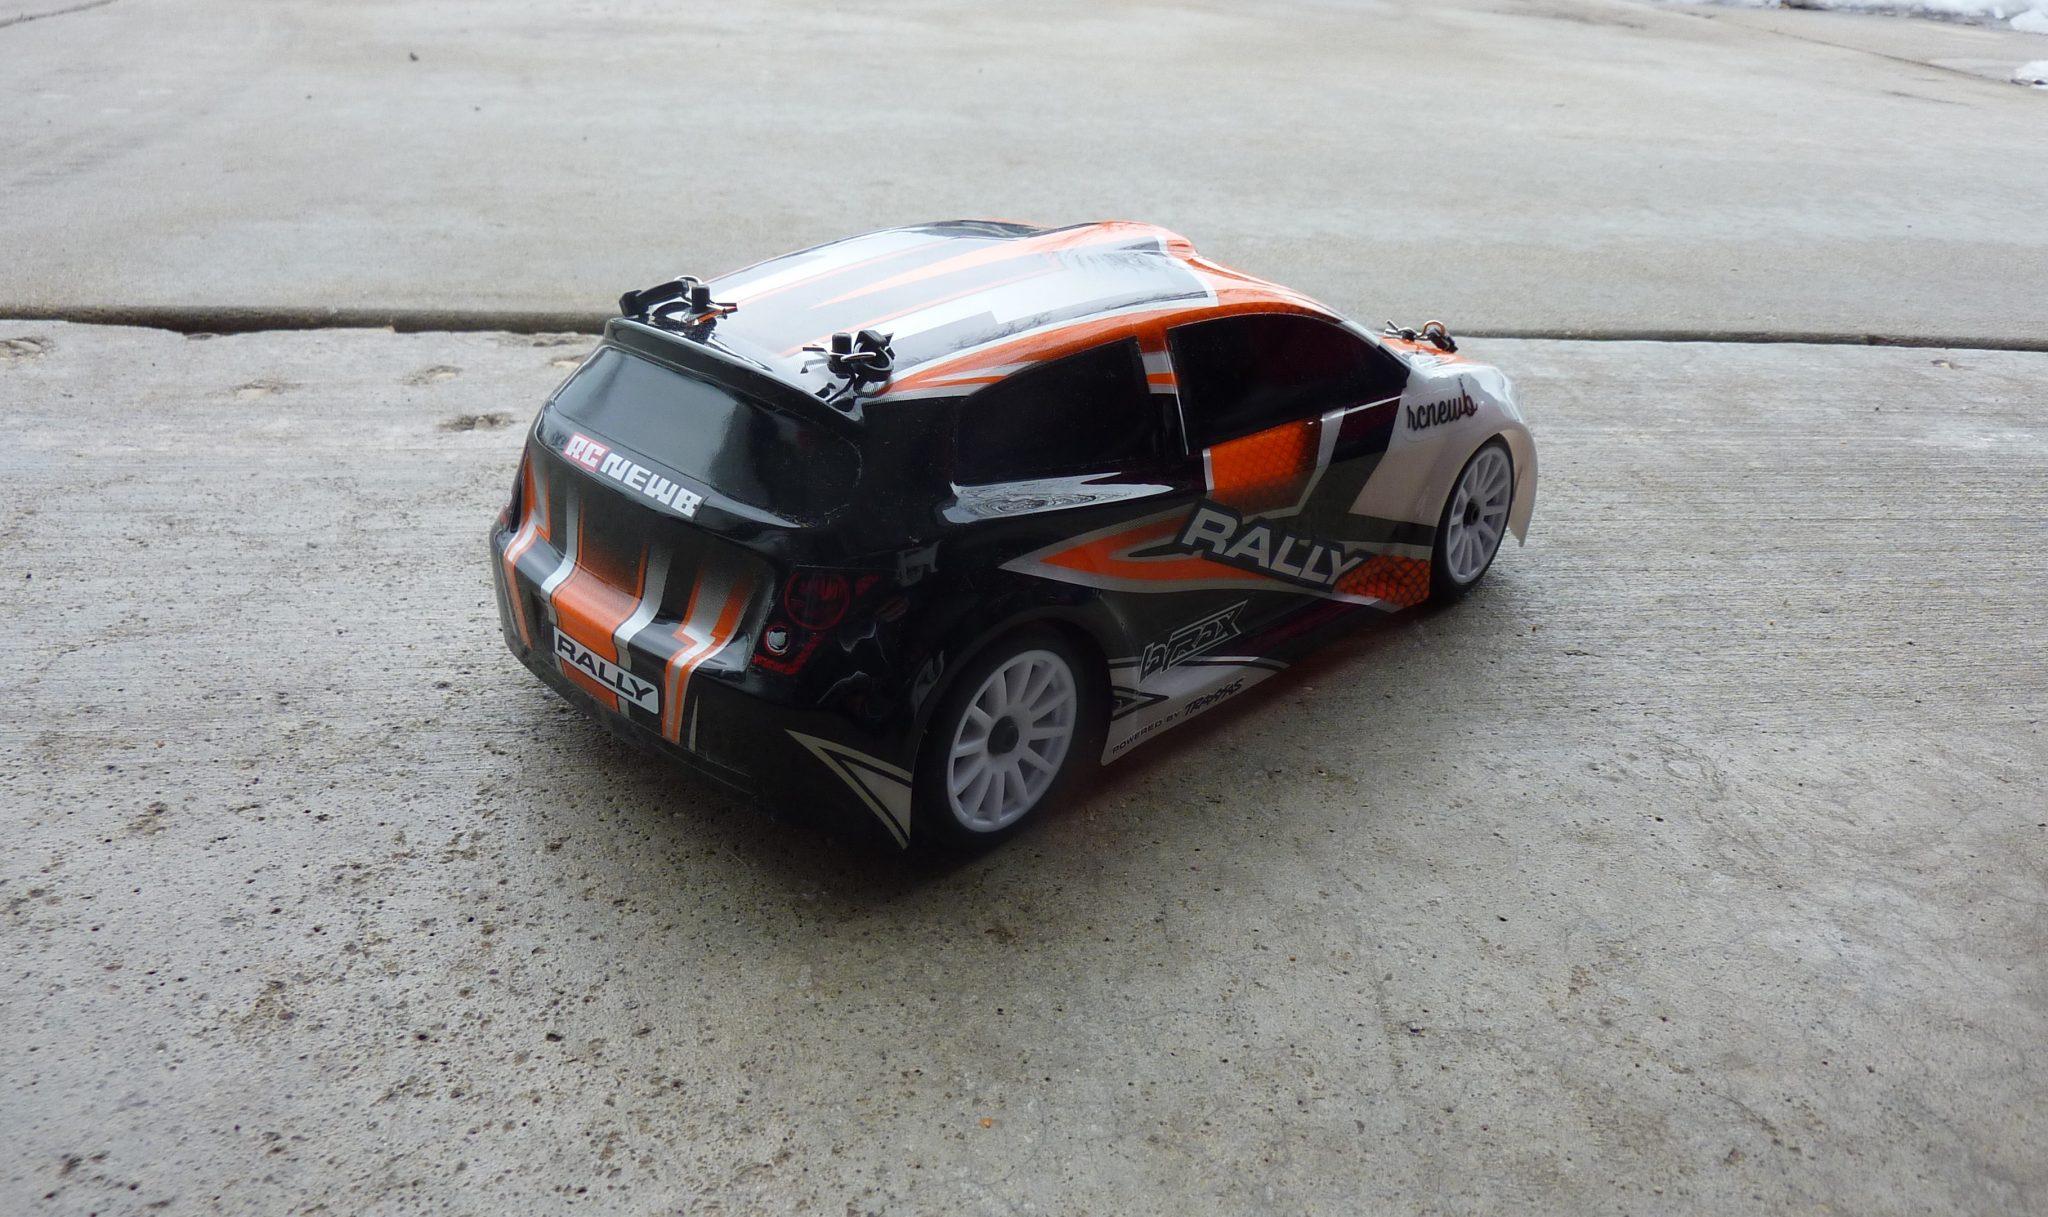 First Drive: LaTrax Rally [Video]